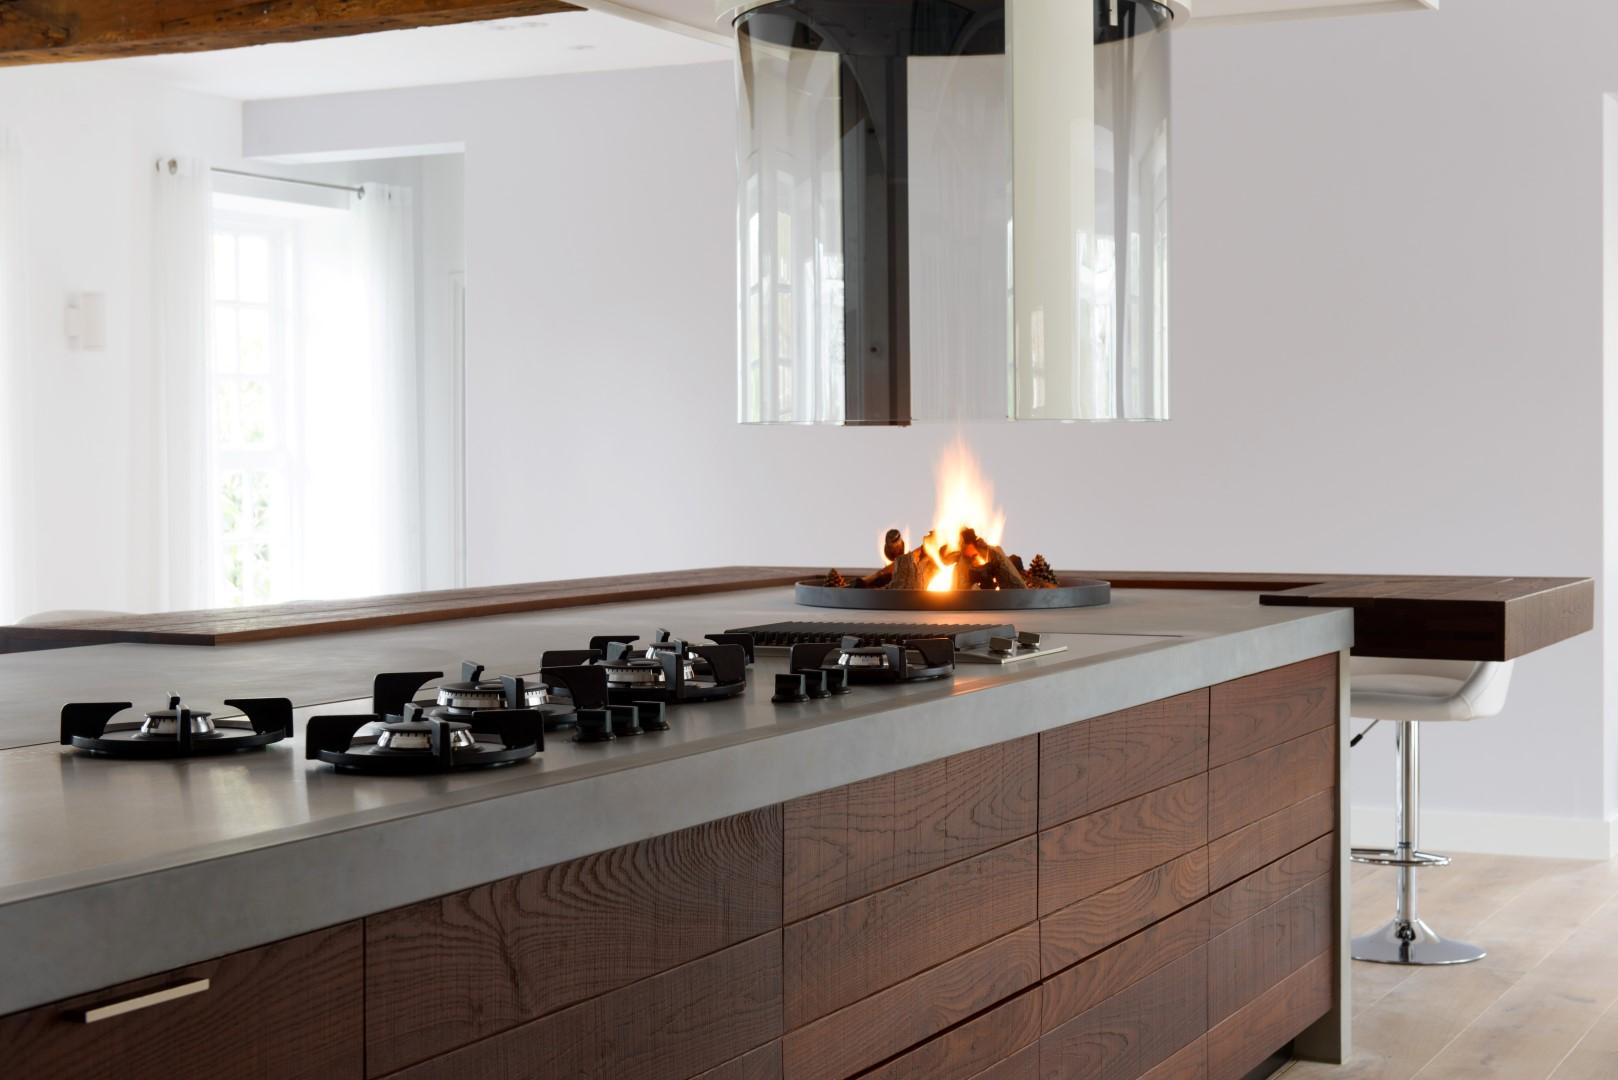 Moderne Keuken Landelijk Maken : Teawood keukeneiland met beton